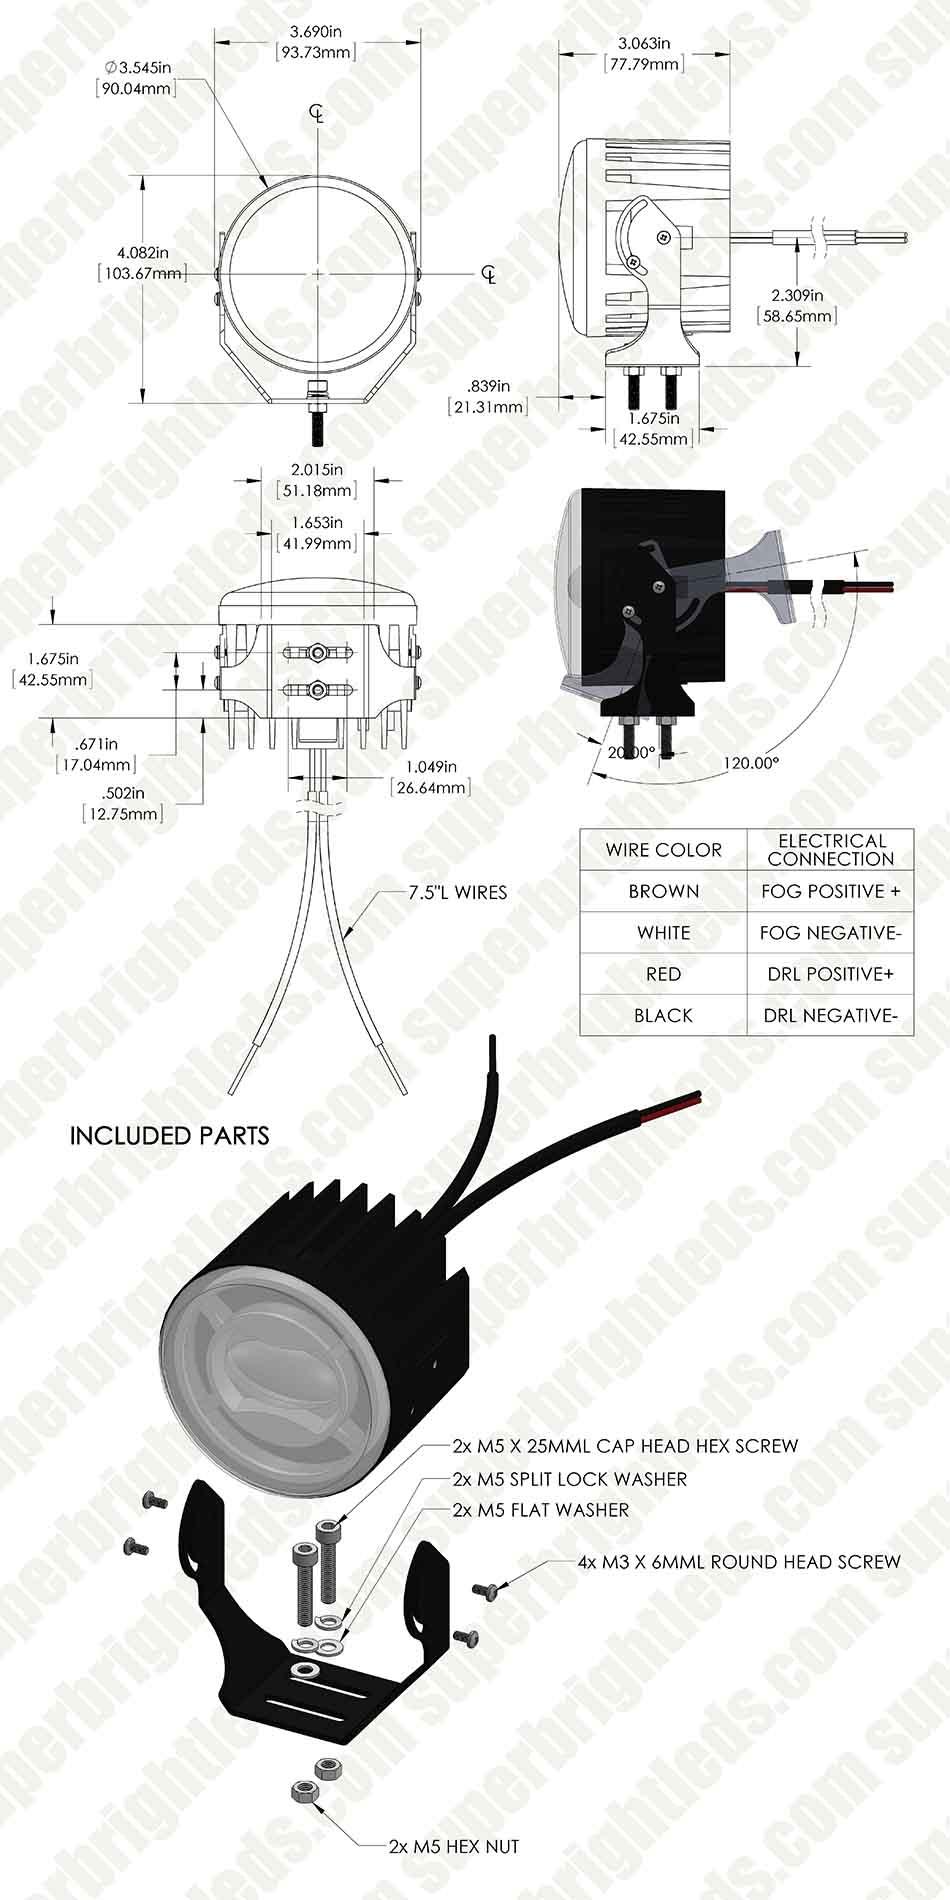 3 1 2 Led Projector Fog Lights Conversion Kit W Halo Daytime Wiring Diagram Running Universal Mount